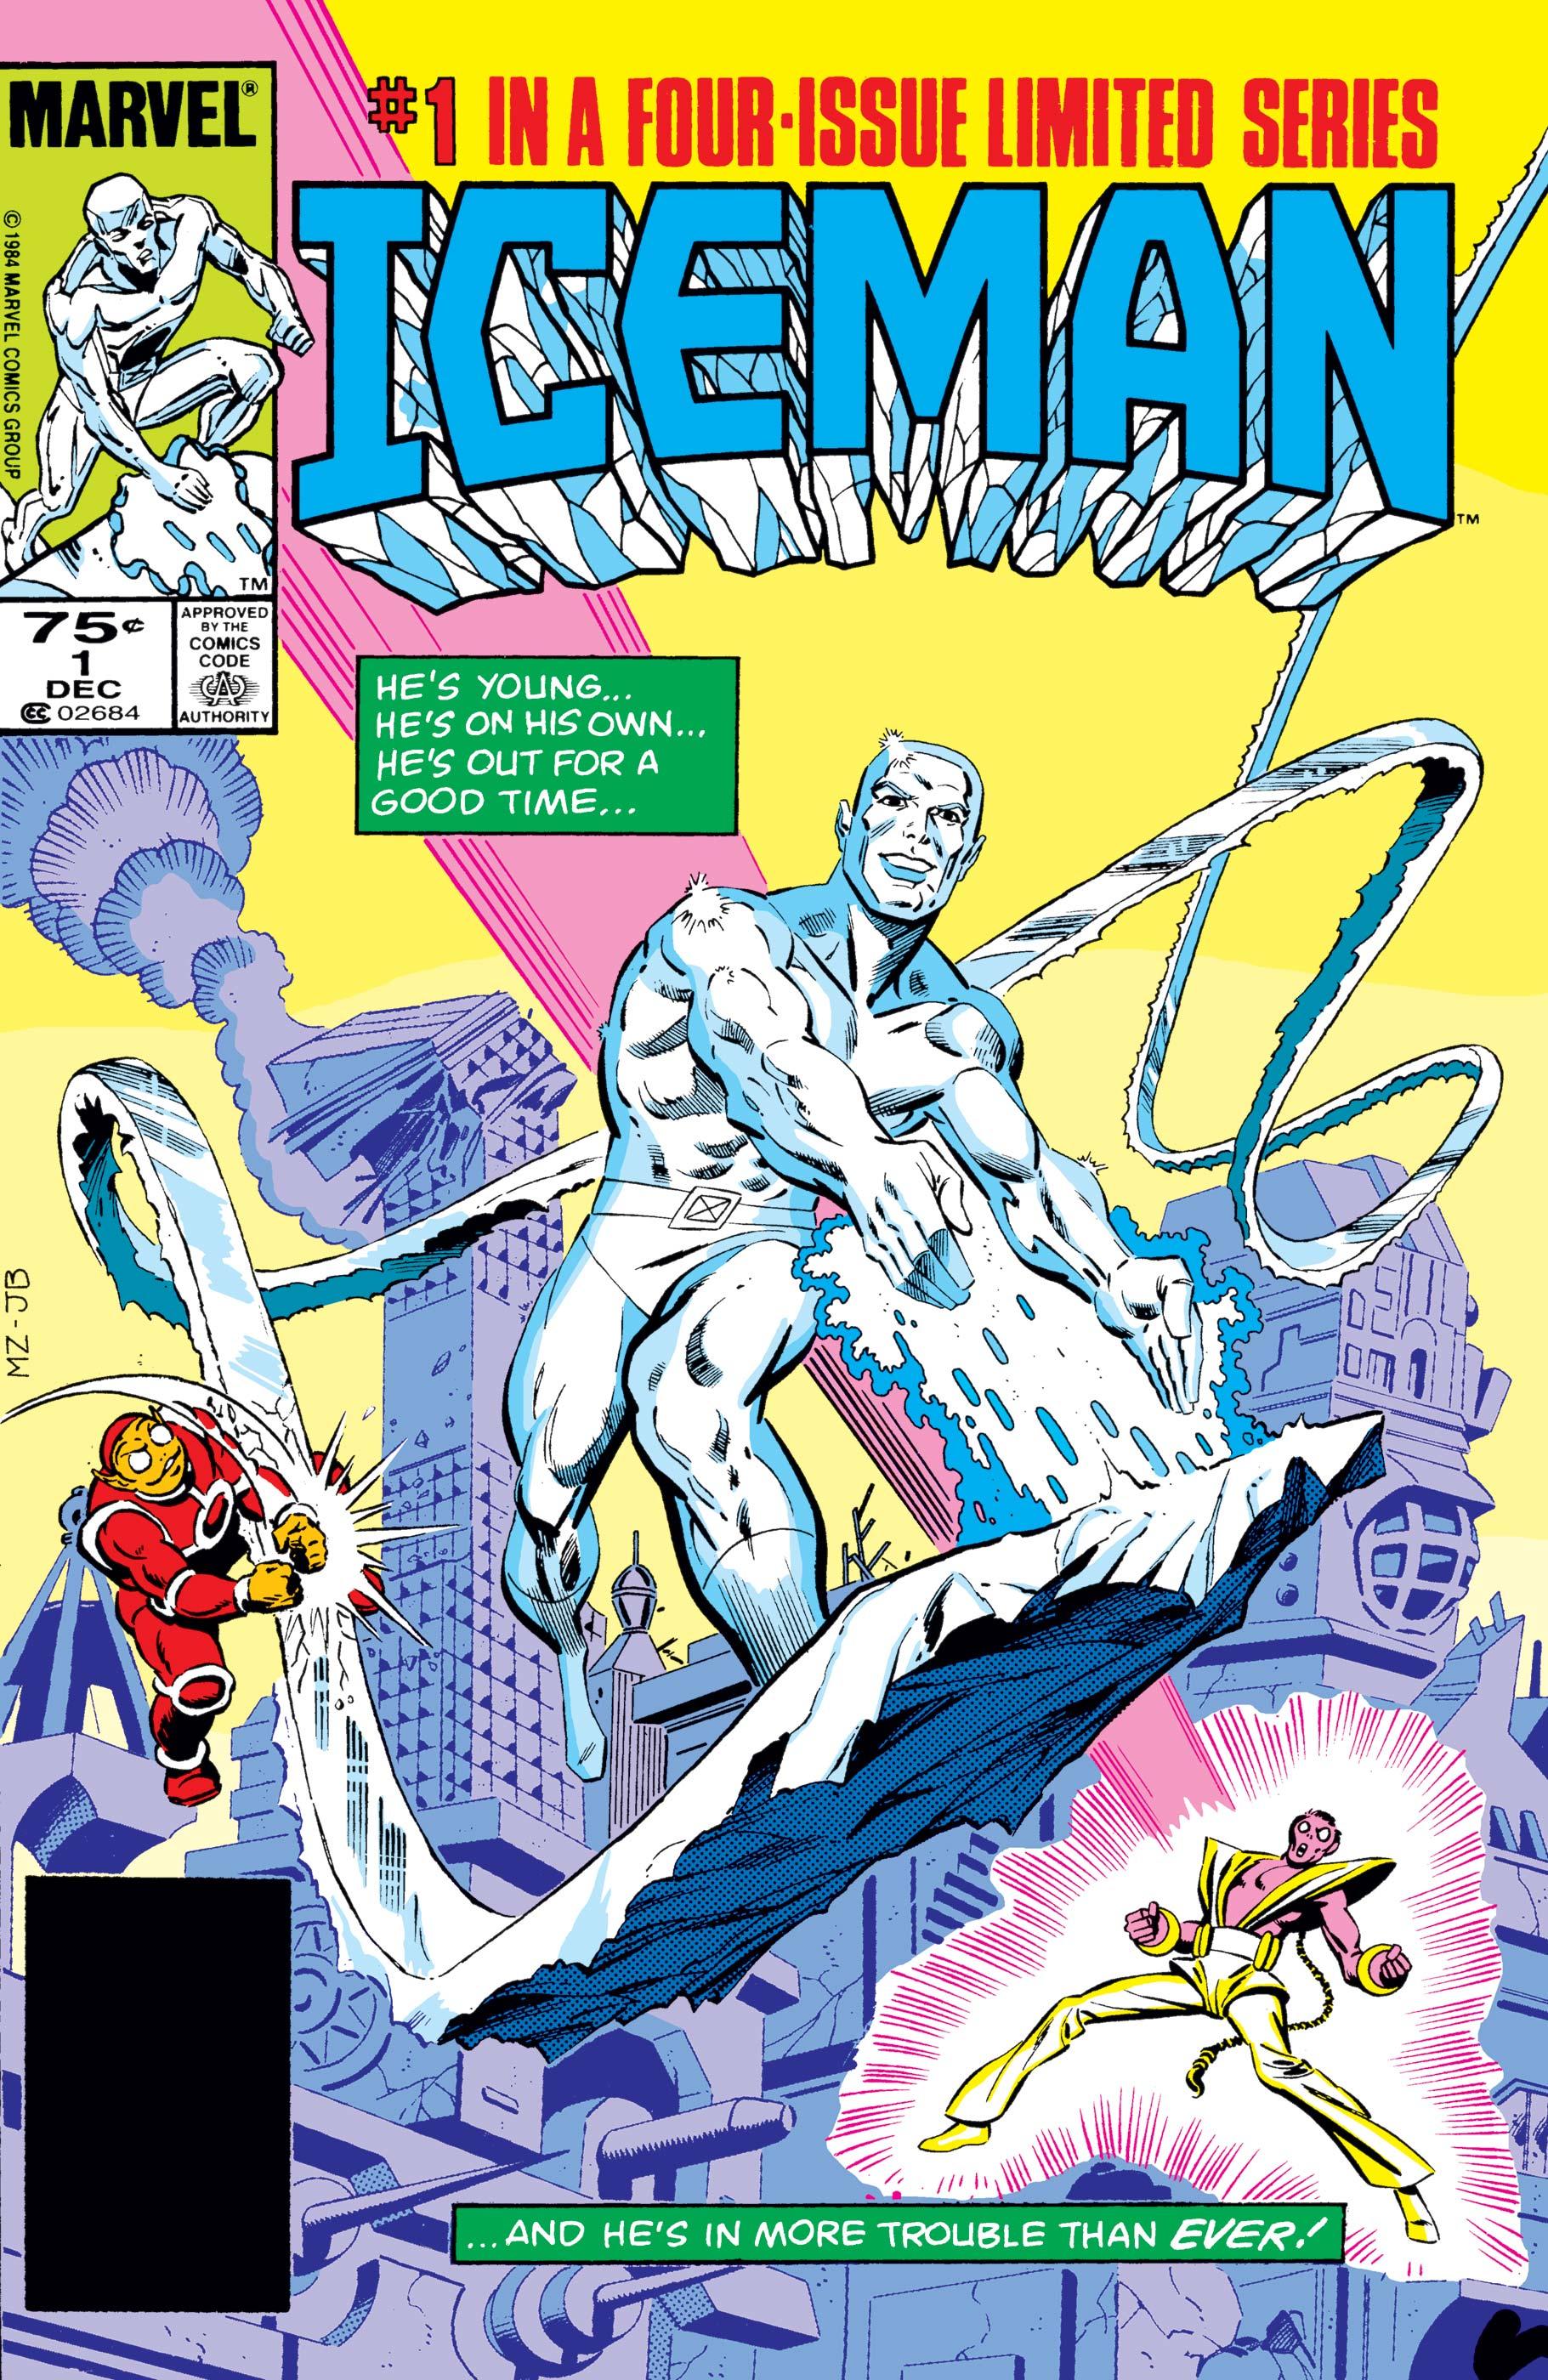 Iceman (1984) #1